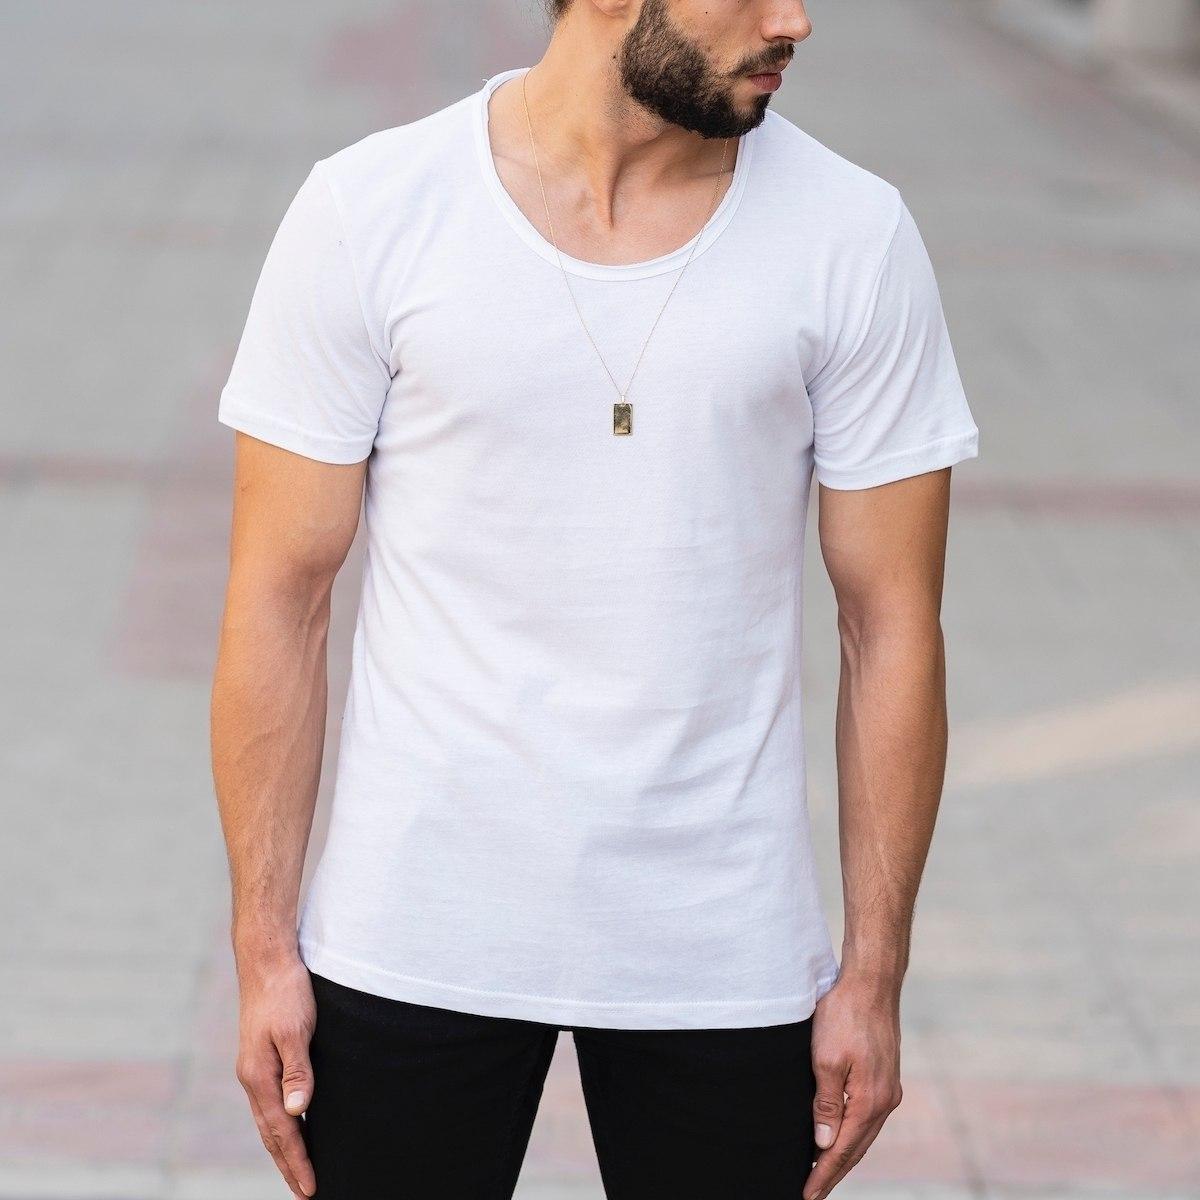 Croped Collar White T-Shirt Mv Premium Brand - 1